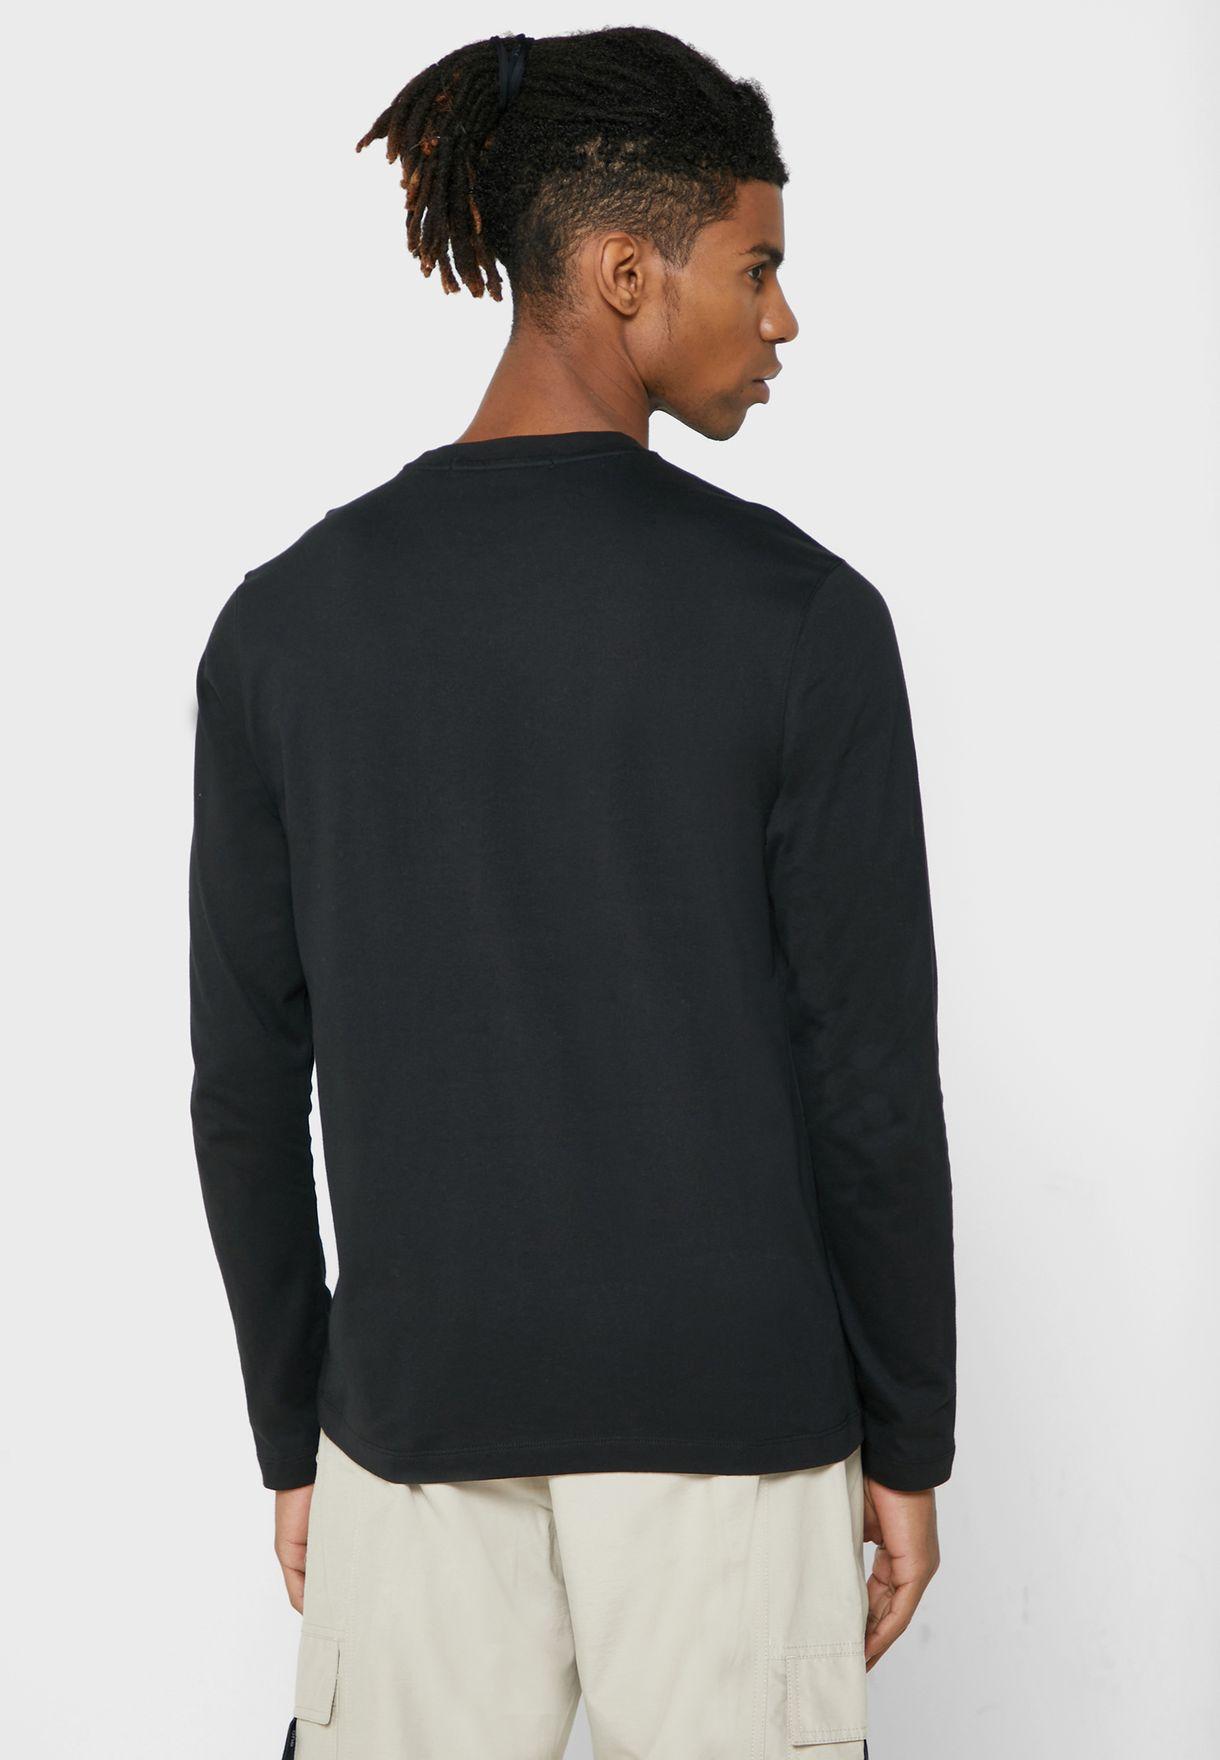 Pocket Detail Crew Neck T-Shirt